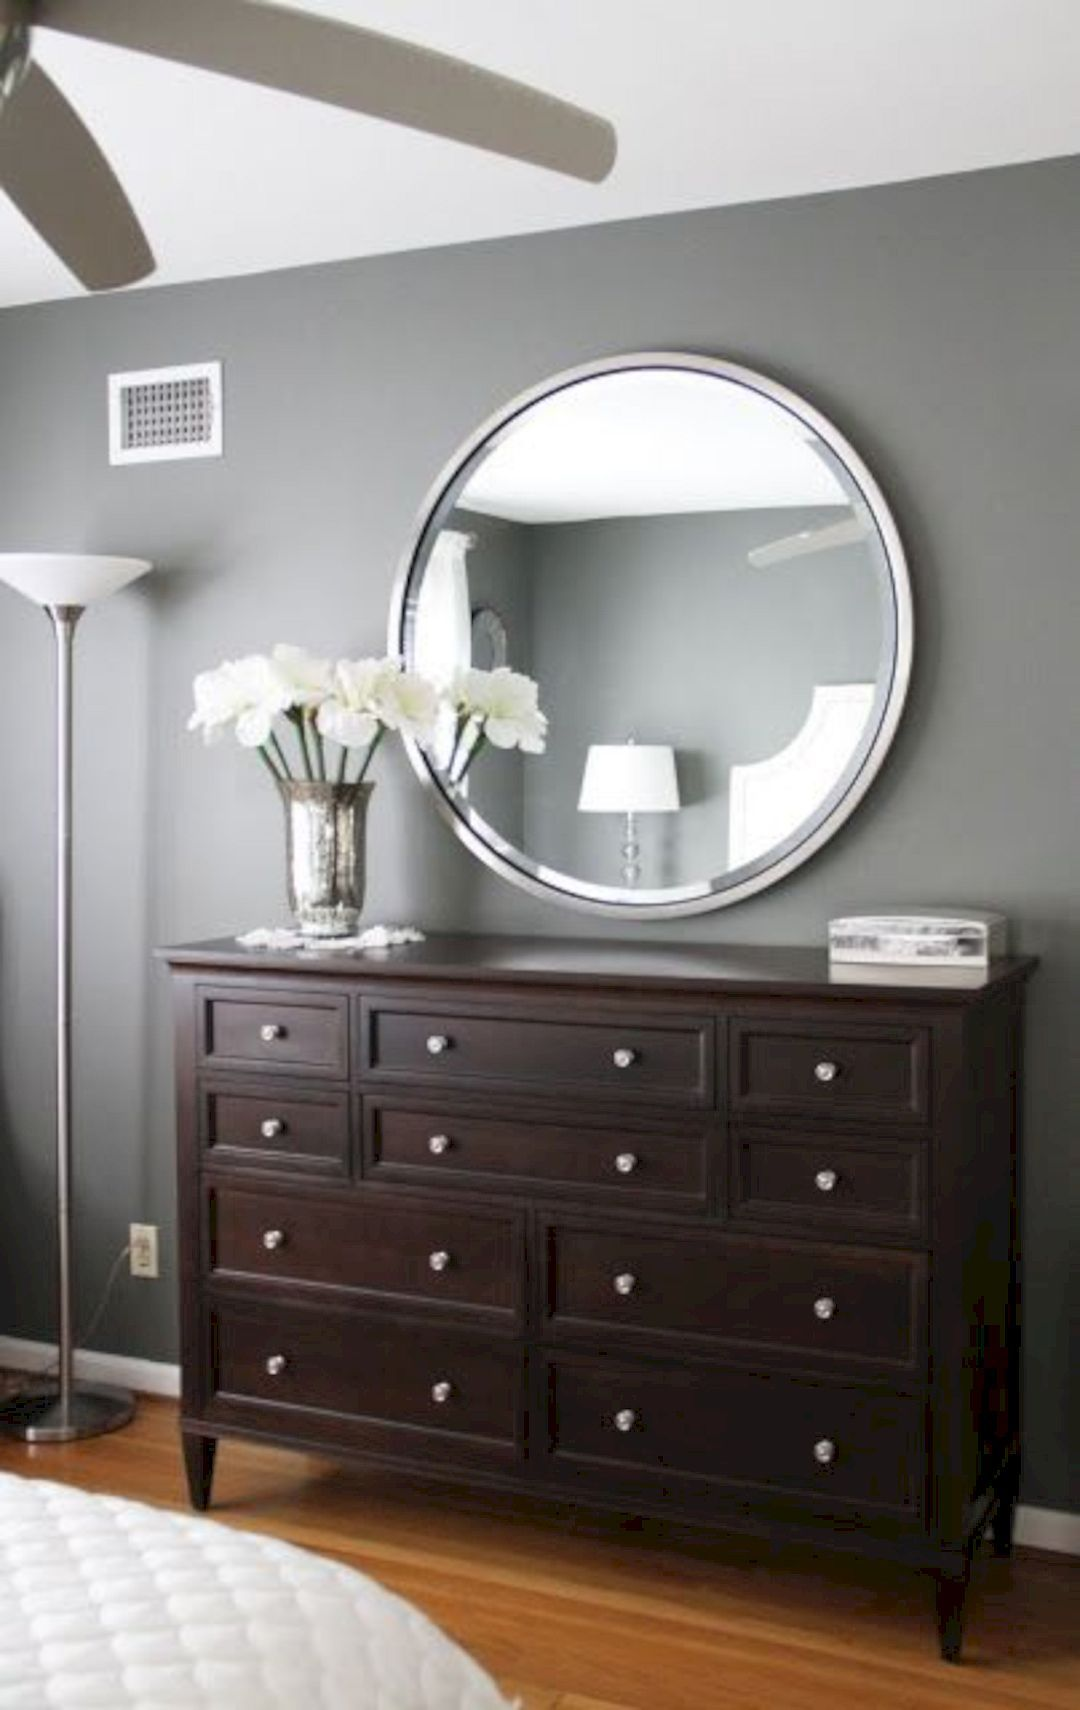 13 Top Brown Furniture Bedroom Ideas Brown Furniture Bedroom Bedroom Makeover Before And After Master Bedroom Makeover